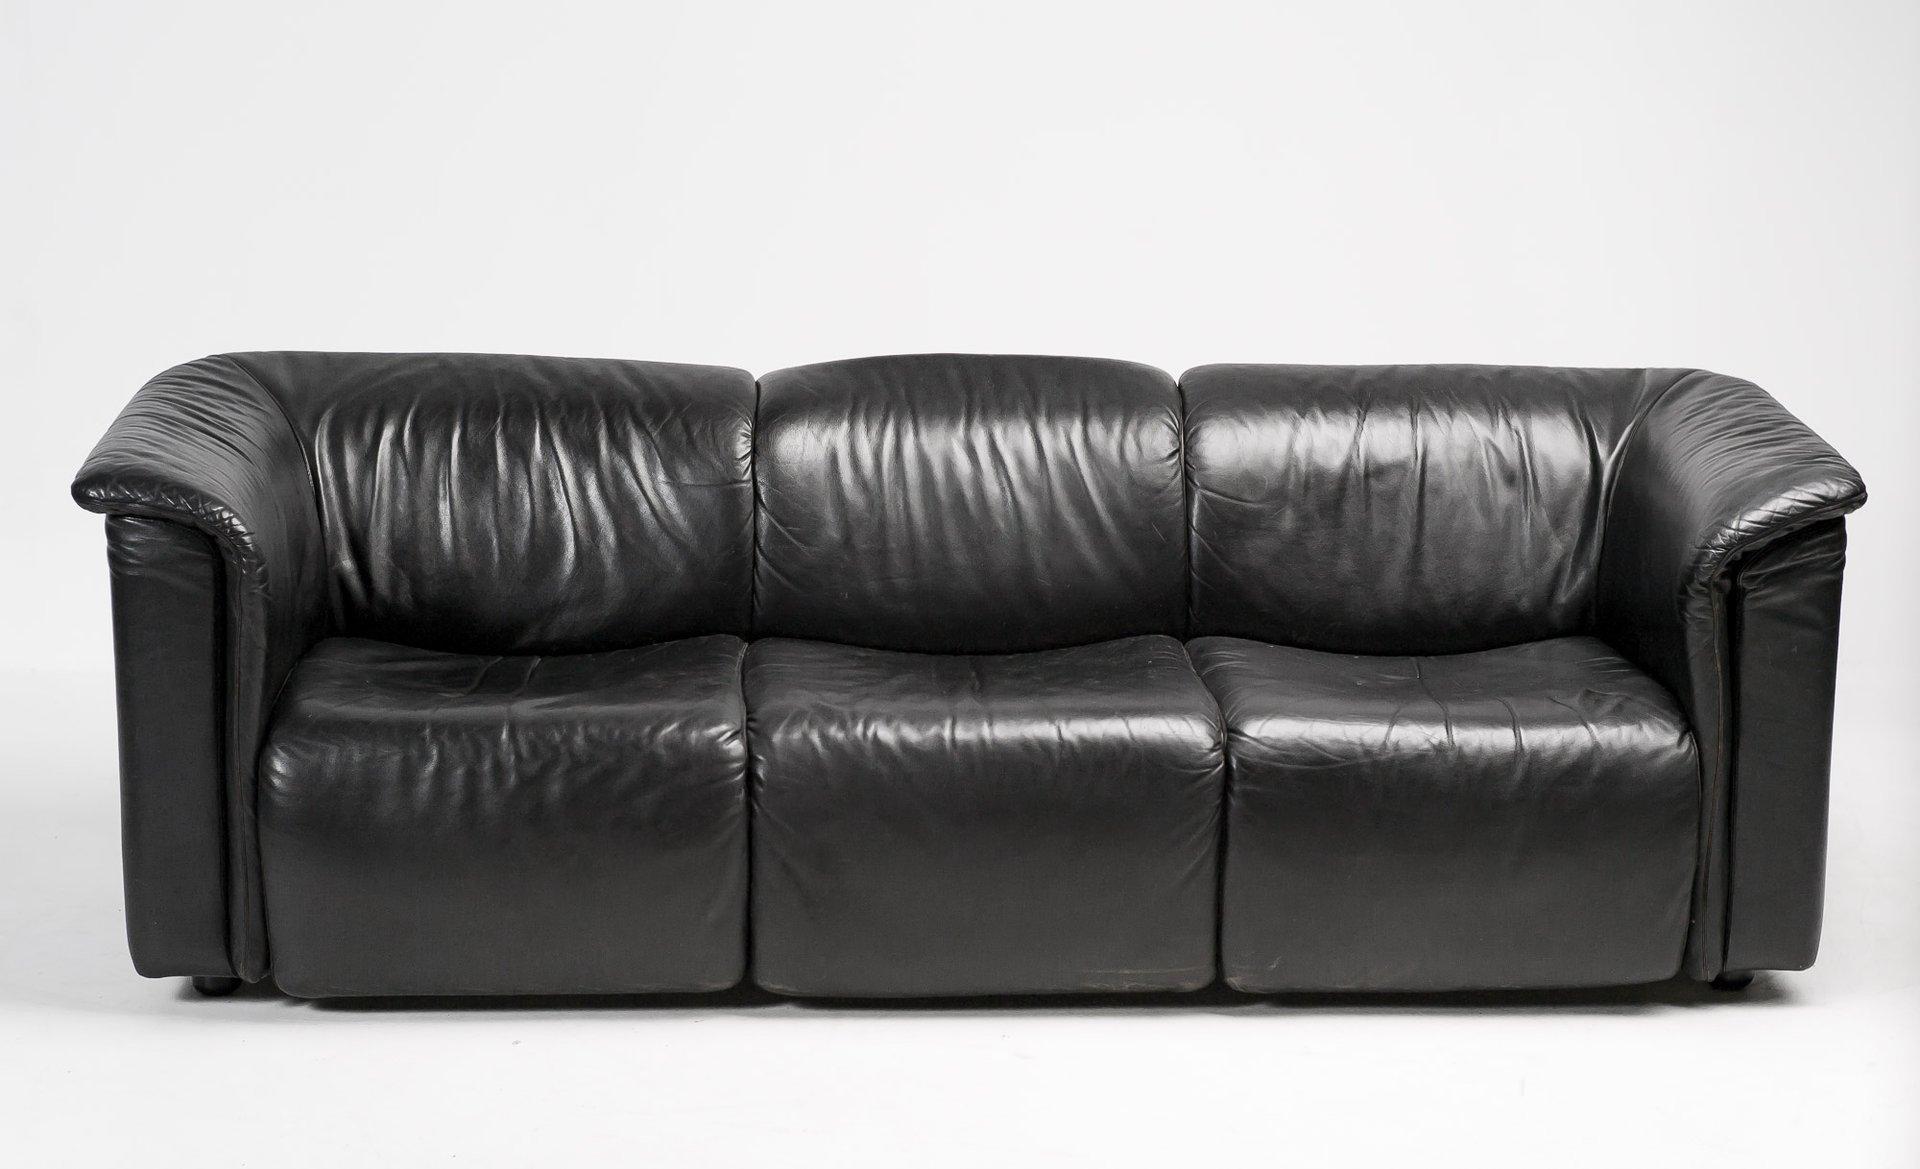 hochbarett black three seater sofa from wittmann moebel. Black Bedroom Furniture Sets. Home Design Ideas